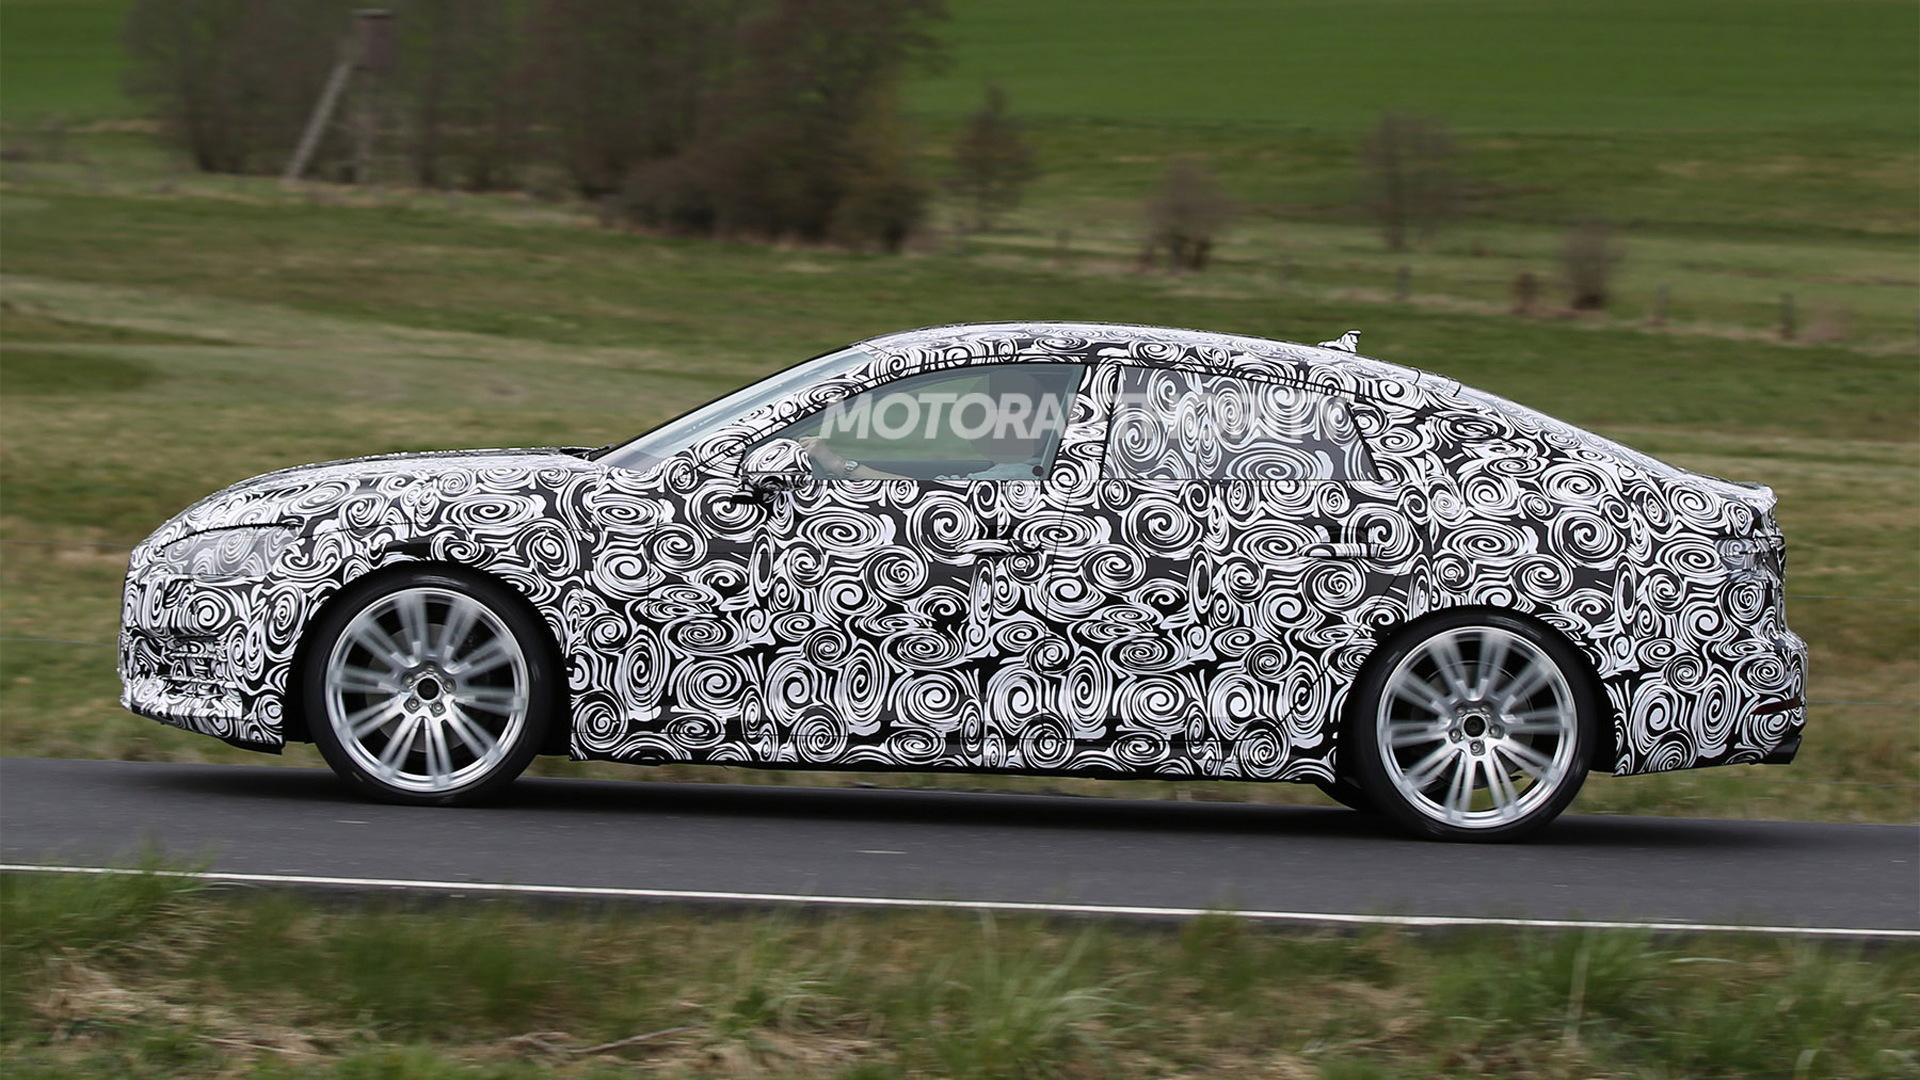 2018 Audi S5 Sportback spy shots - Image via S. Baldauf/SB-Medien